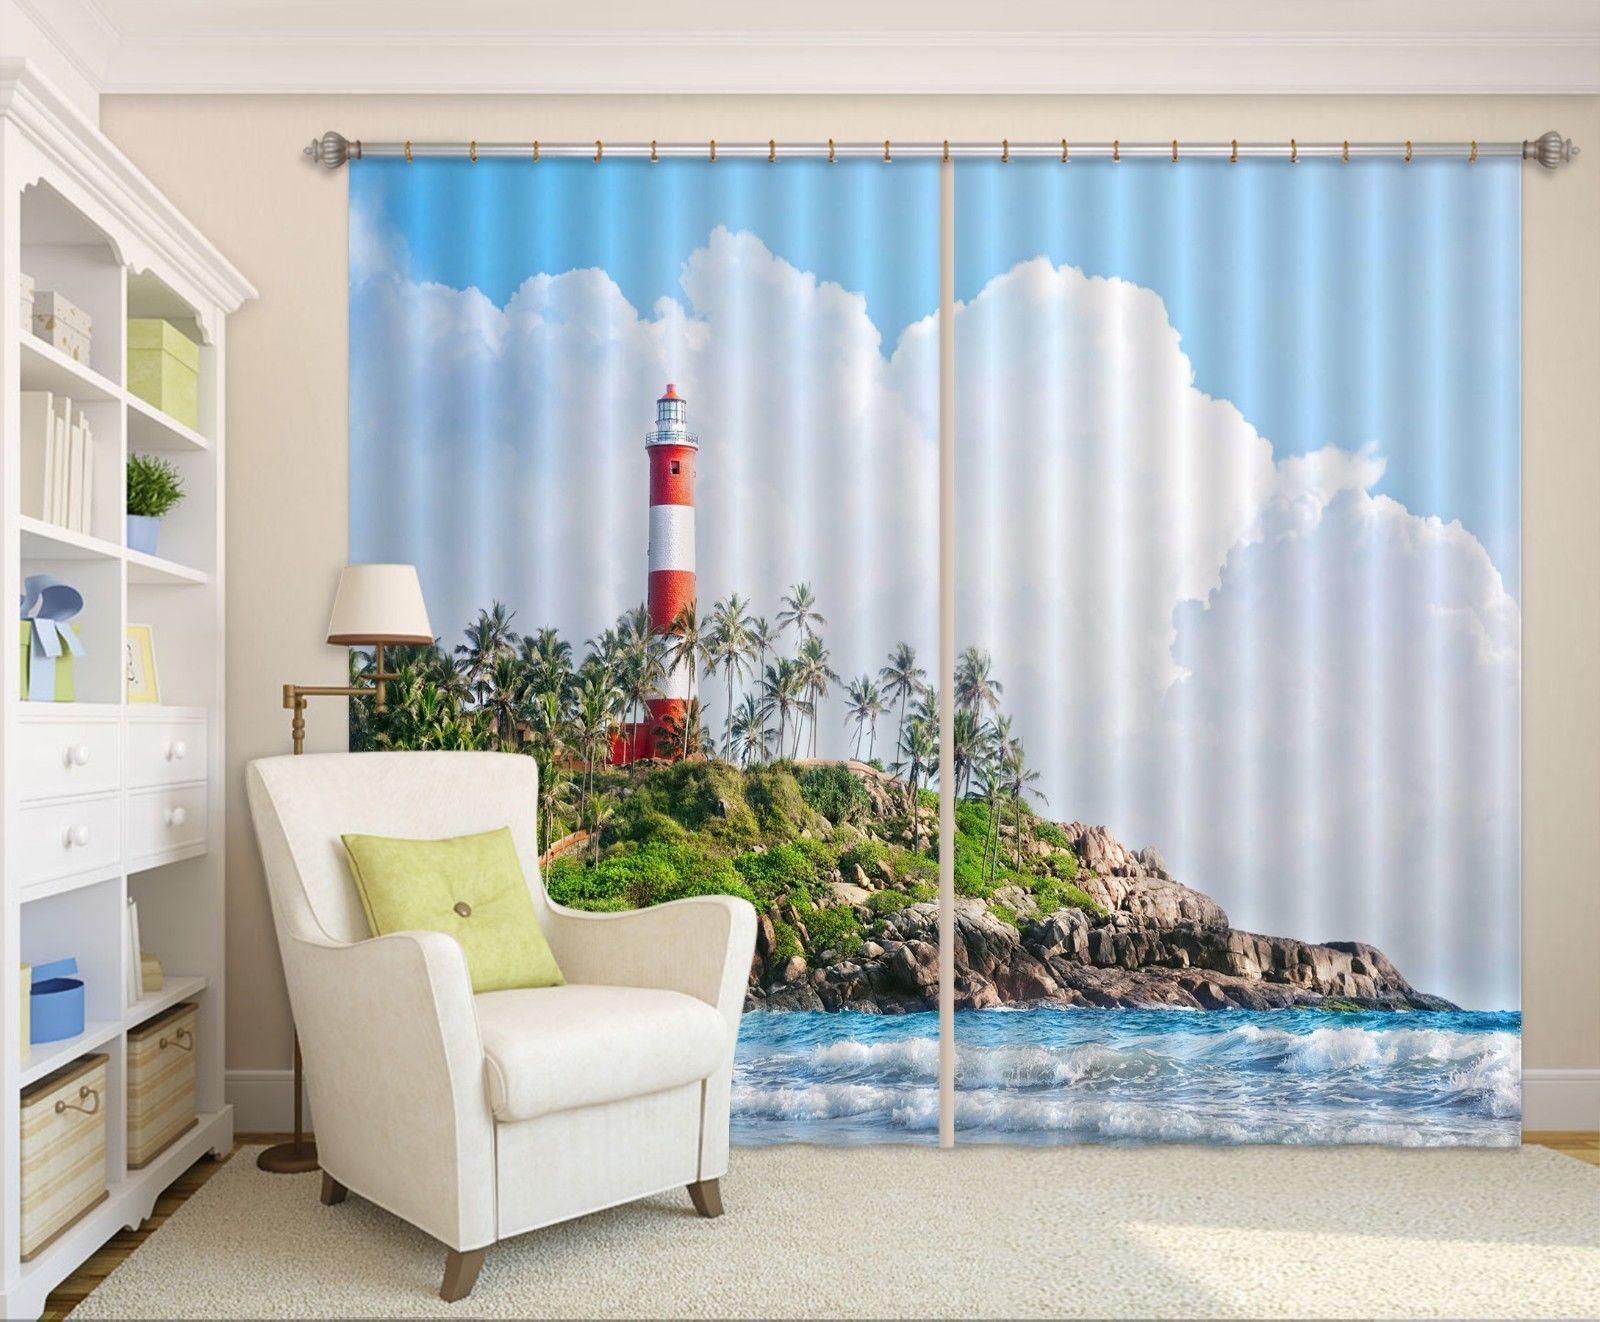 3D White Clouds Tower 01 Blockout Photo Curtain Print Curtains Drapes US Lemon - $177.64 - $467.49